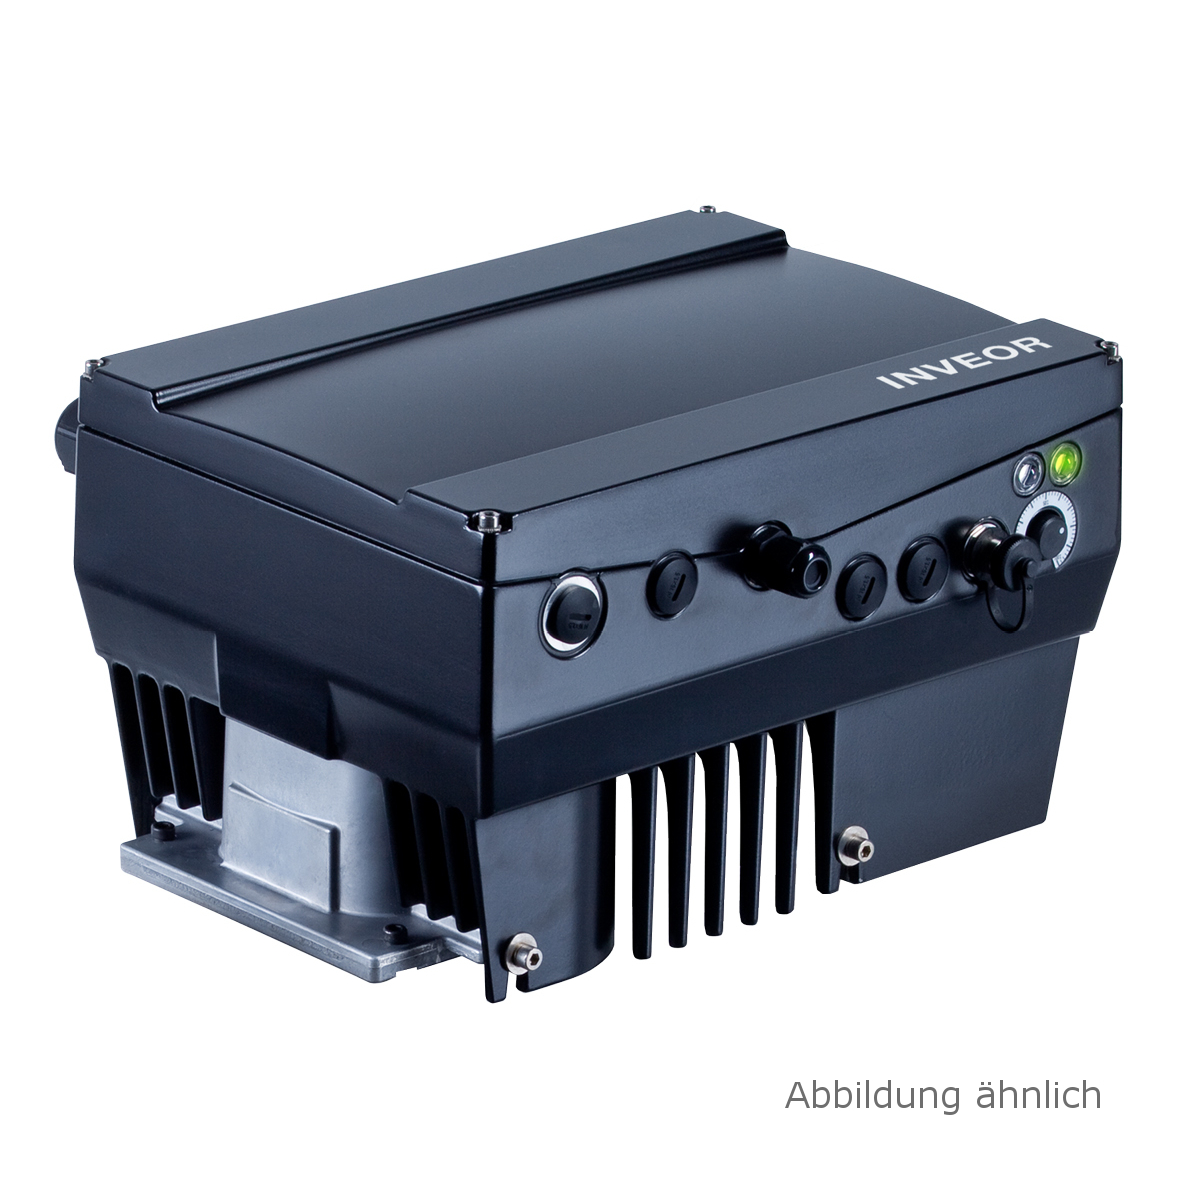 kostal frequenzumrichter inveor mc 5 5 kw standard 400v schulthei antriebstechnik. Black Bedroom Furniture Sets. Home Design Ideas